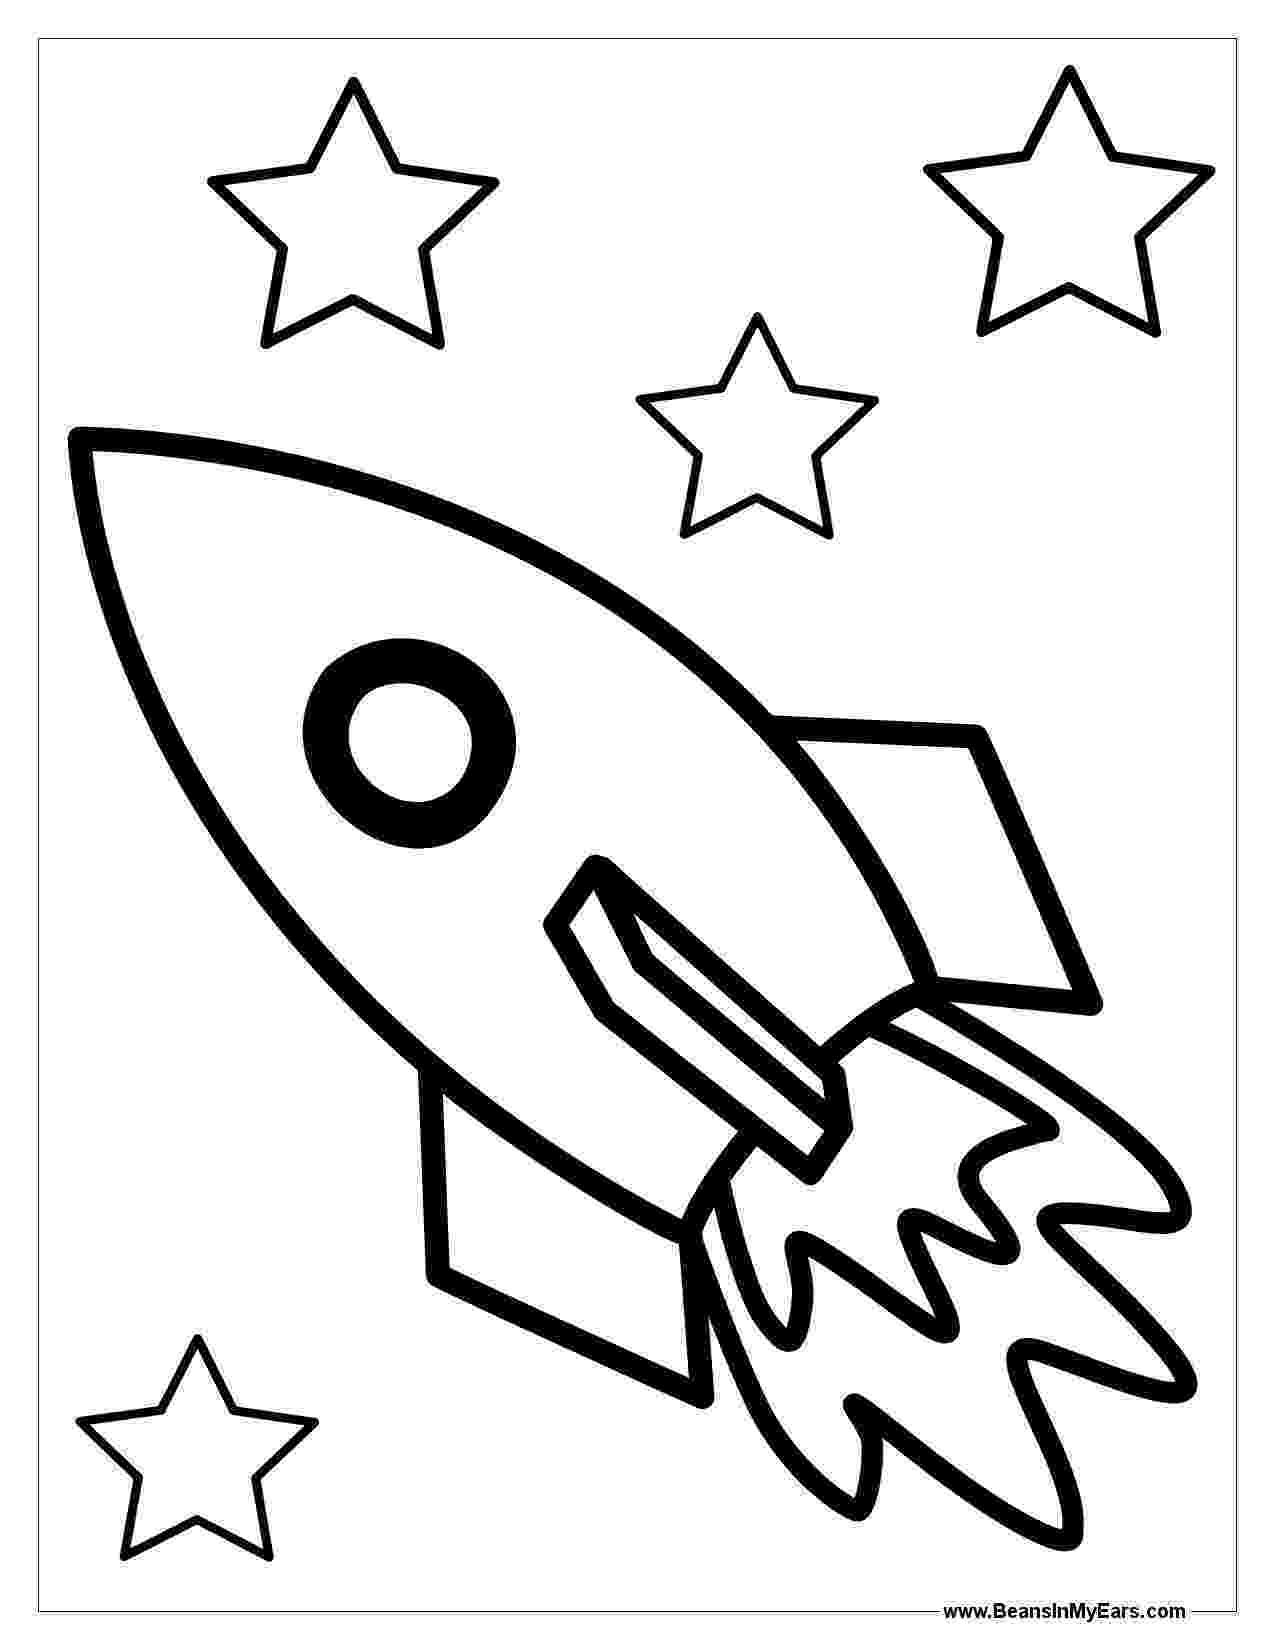 printable coloring pages rocket ship printable rocket ship coloring pages for kids cool2bkids rocket printable coloring ship pages